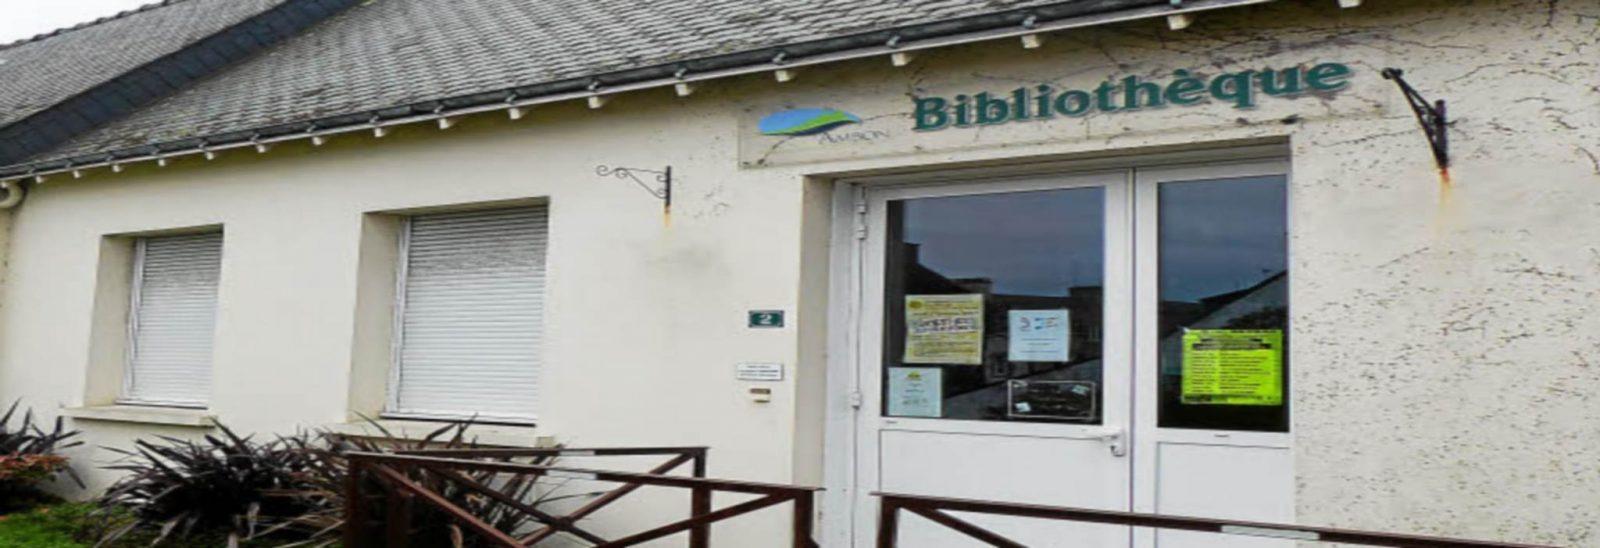 Bibliotheque-Ambon-Damgan la roche bernard tourisme